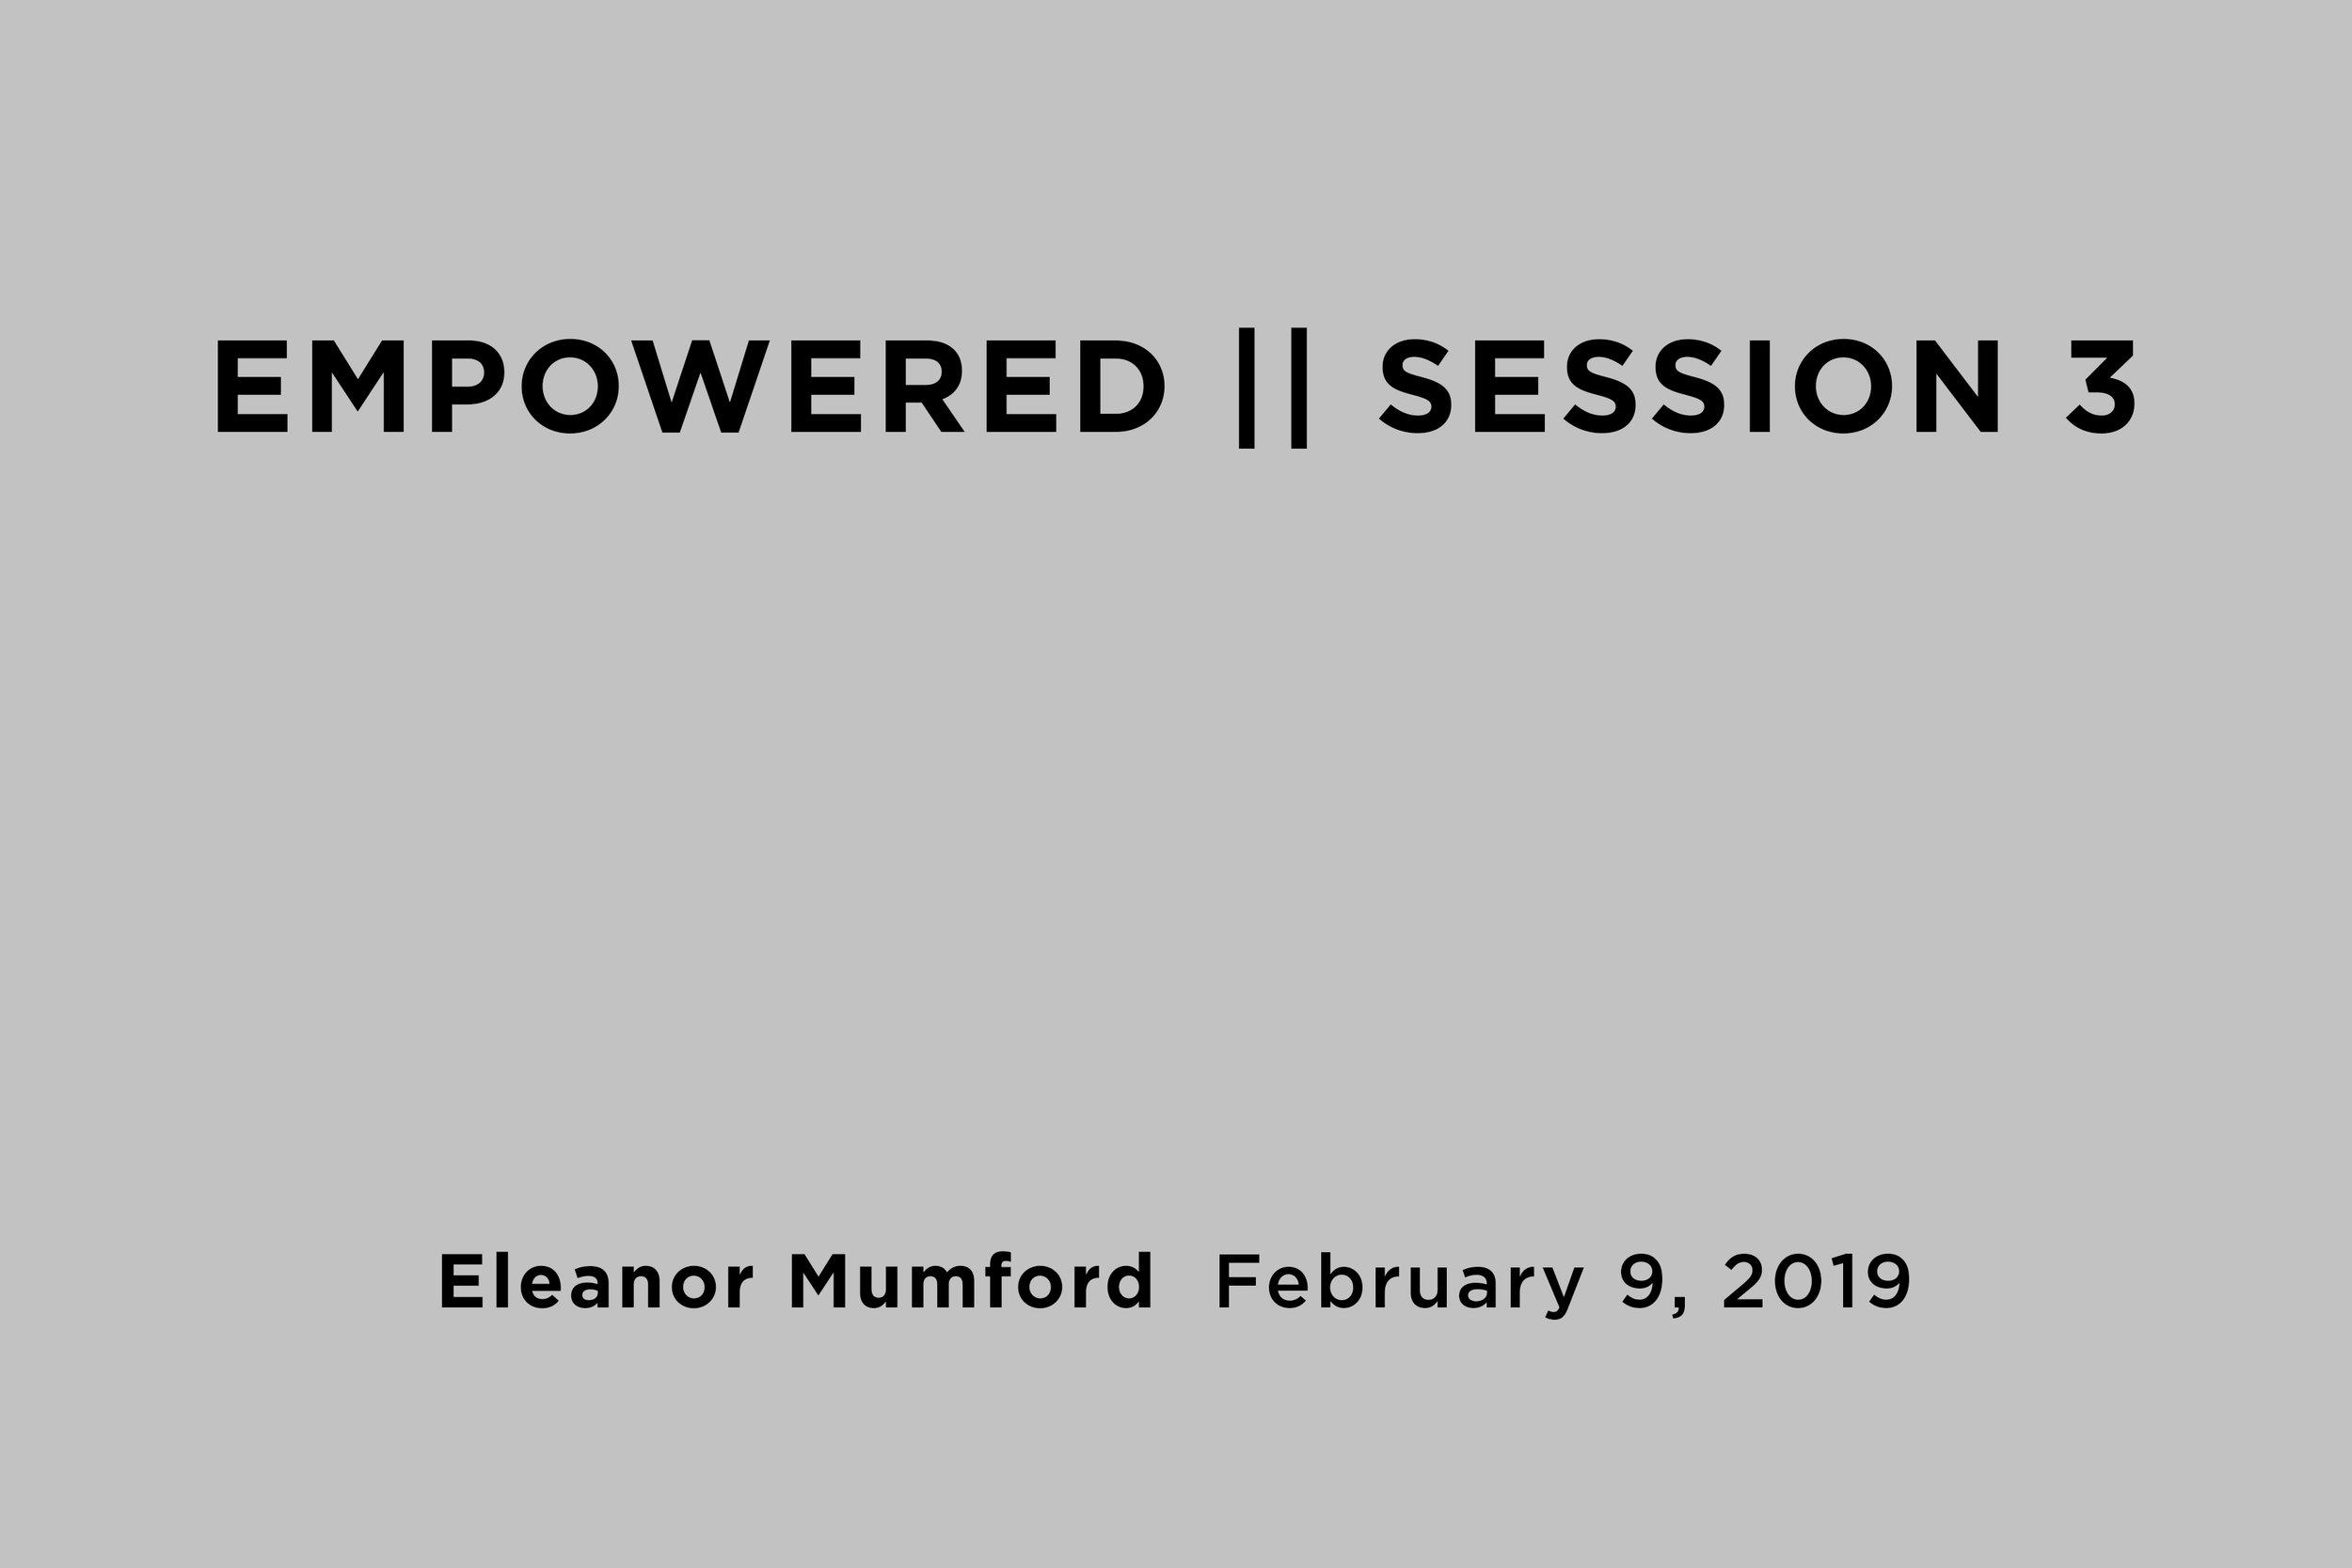 Empowered-Ses-3.jpg